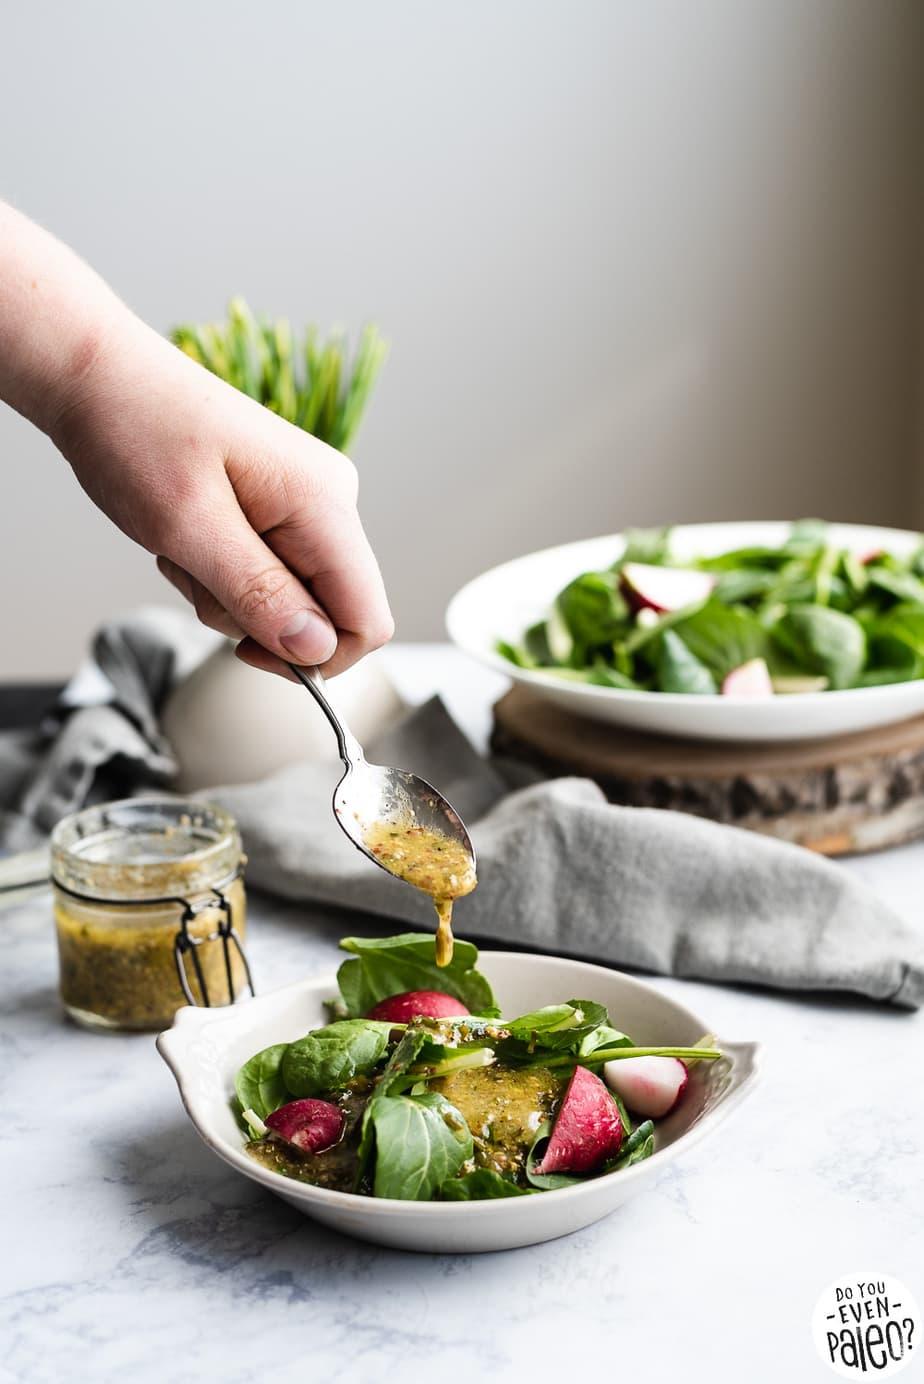 Mustard Chive Vinaigrette Recipe | DoYouEvenPaleo.net